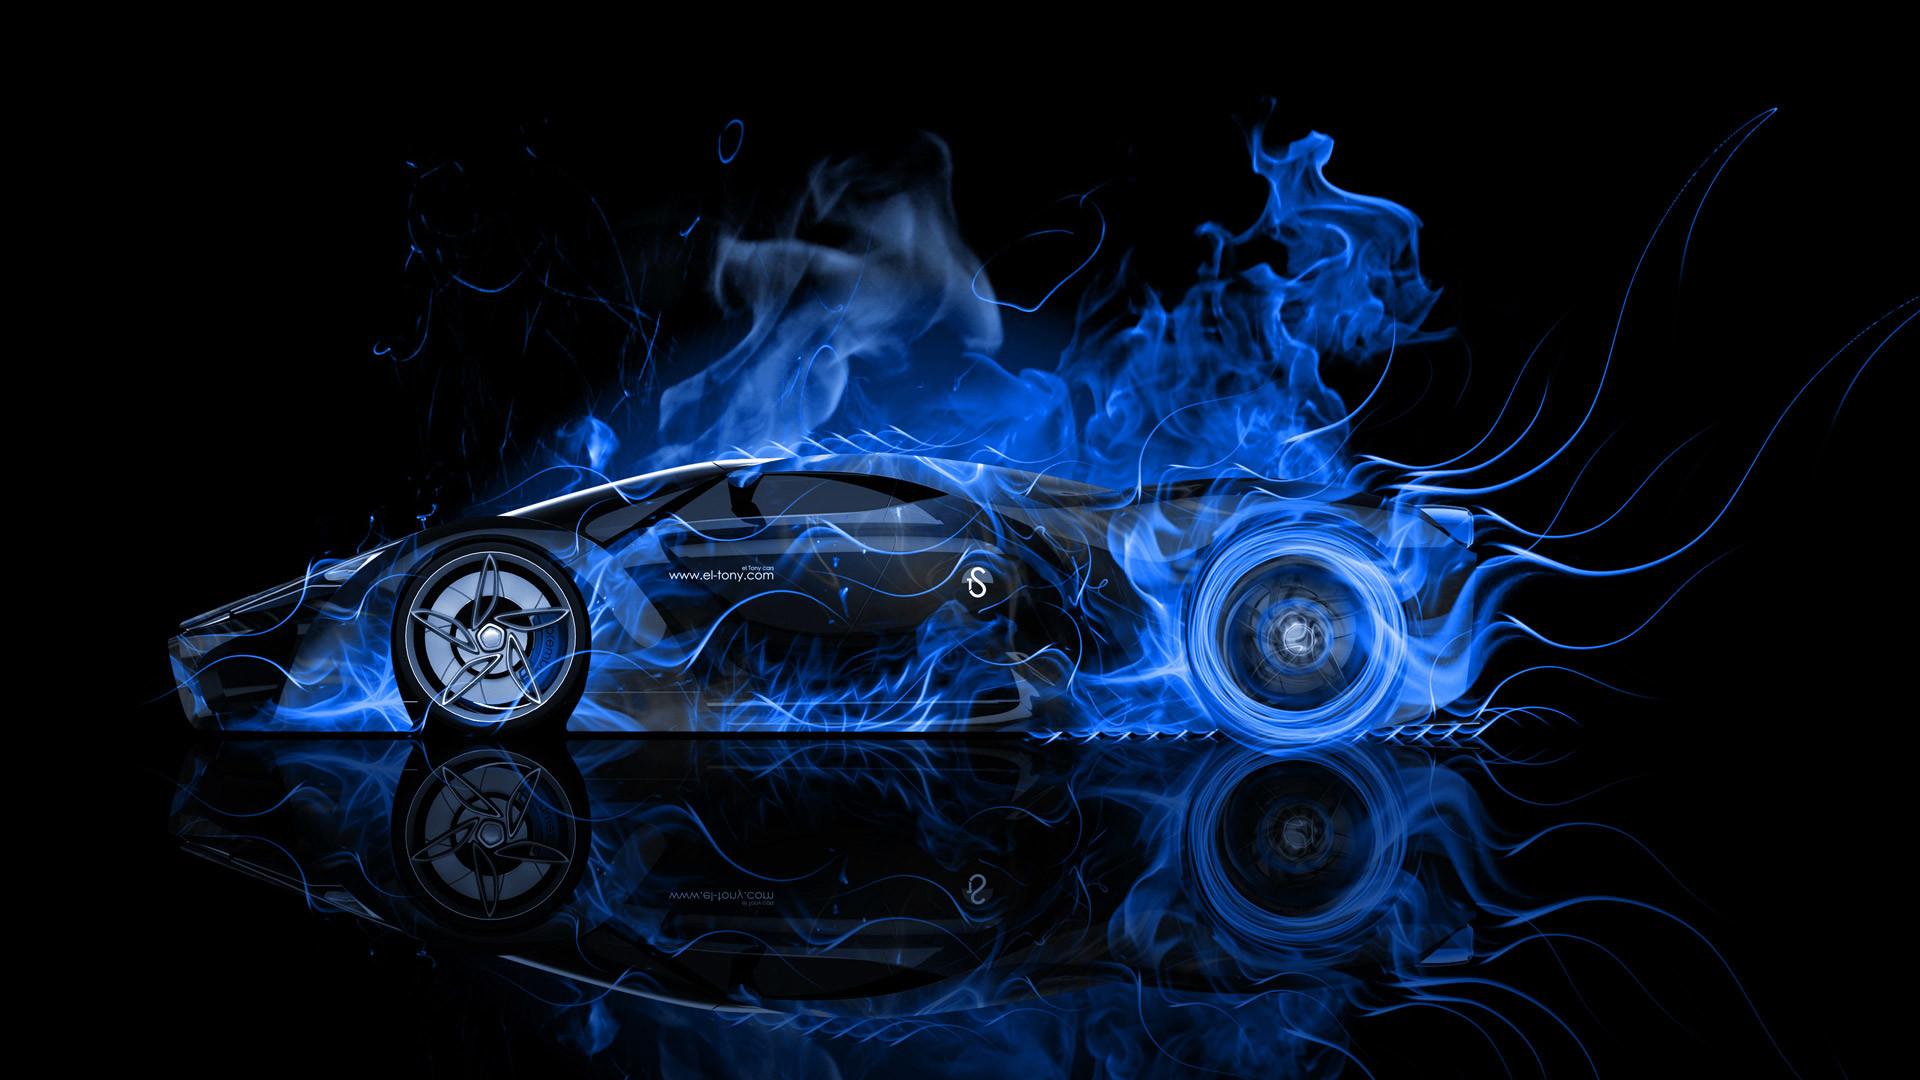 Res: 1920x1080, Ferrari-F80-Side-Blue-Fire-Abstract-Car-2014-